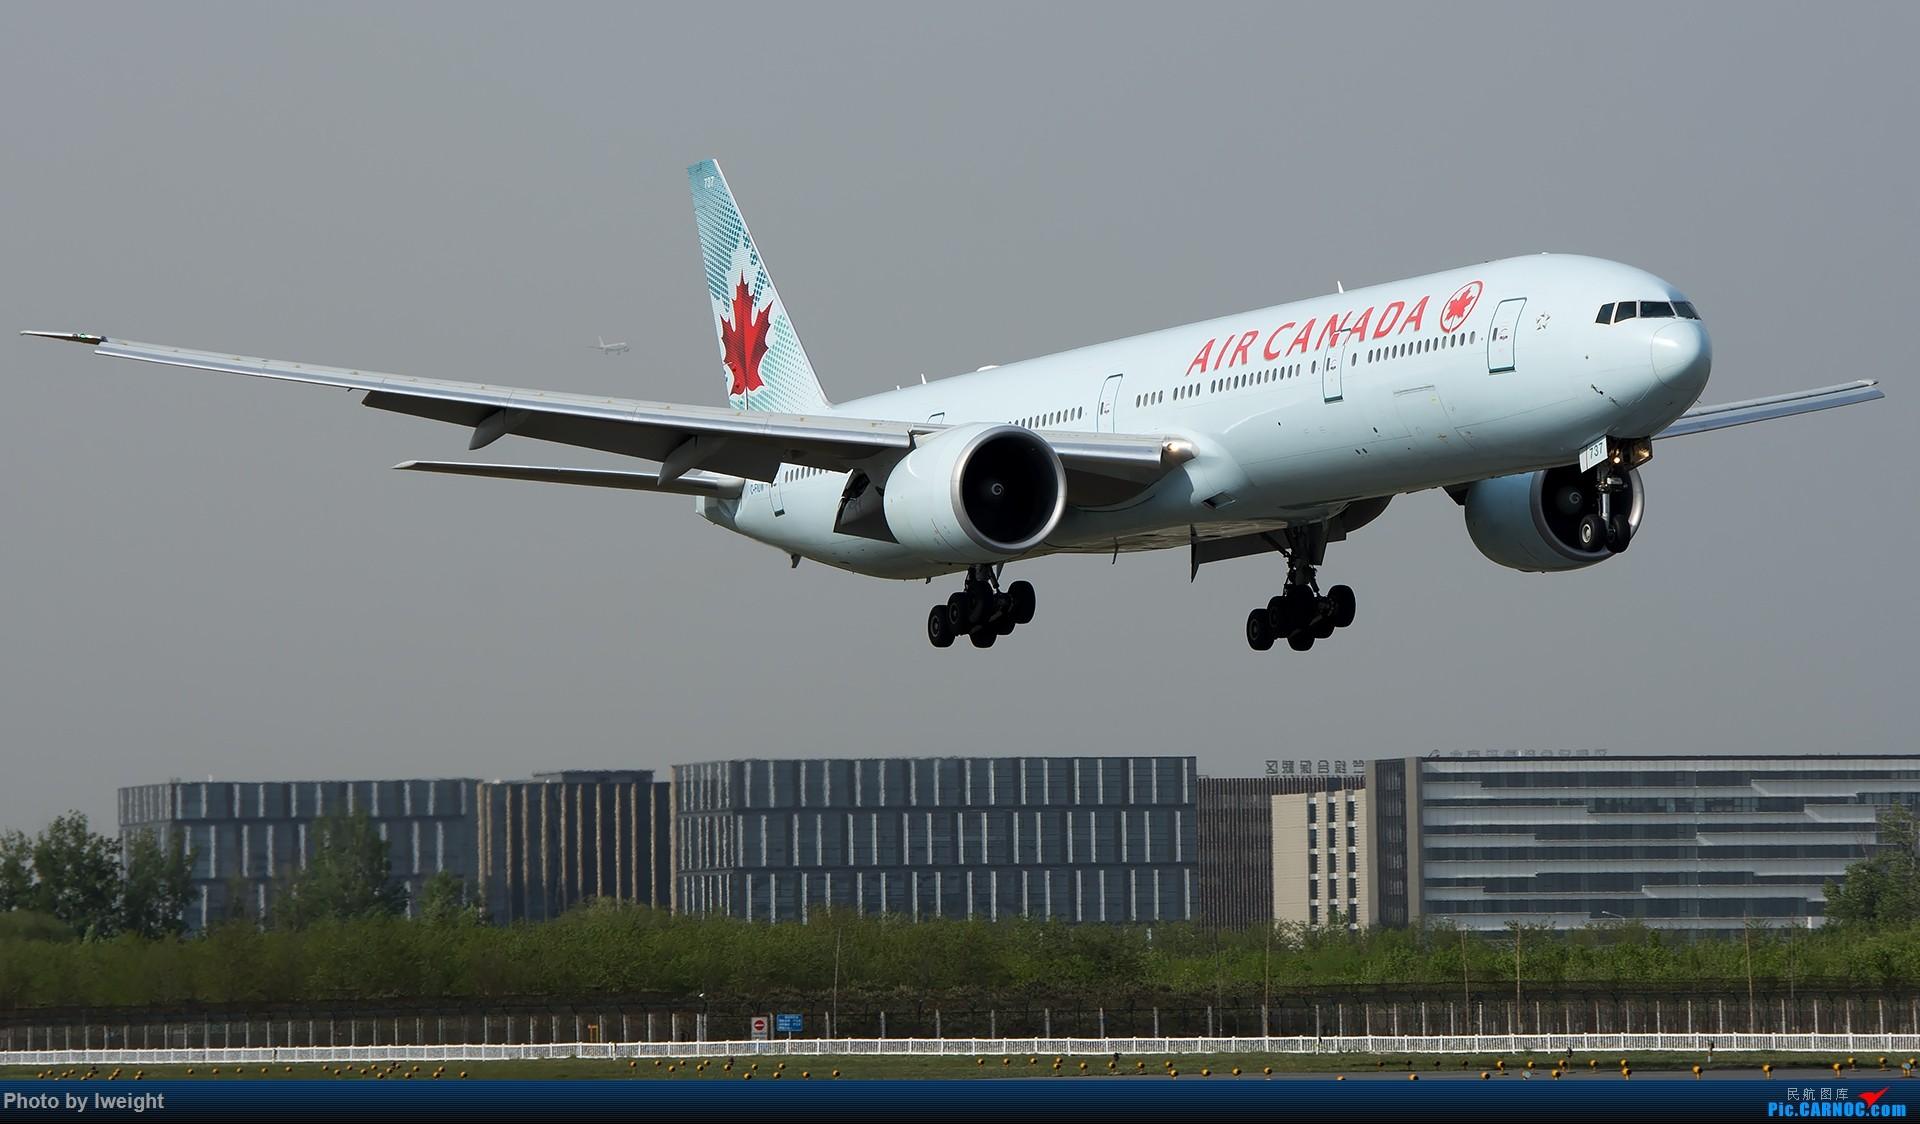 Re:[原创]天气晴朗,继续守候18R【多图】 BOEING 777-300ER C-FIUW 中国北京首都国际机场